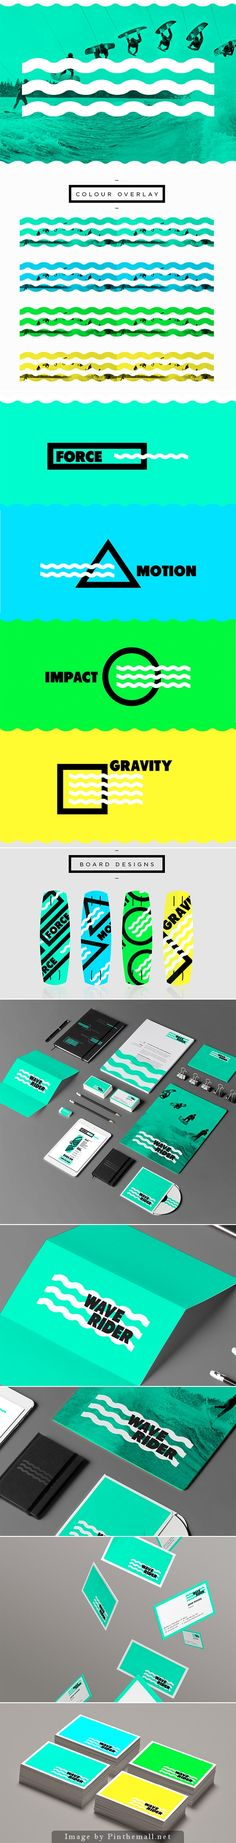 Wake boarding branding makes a splash by Jonathan Quintin